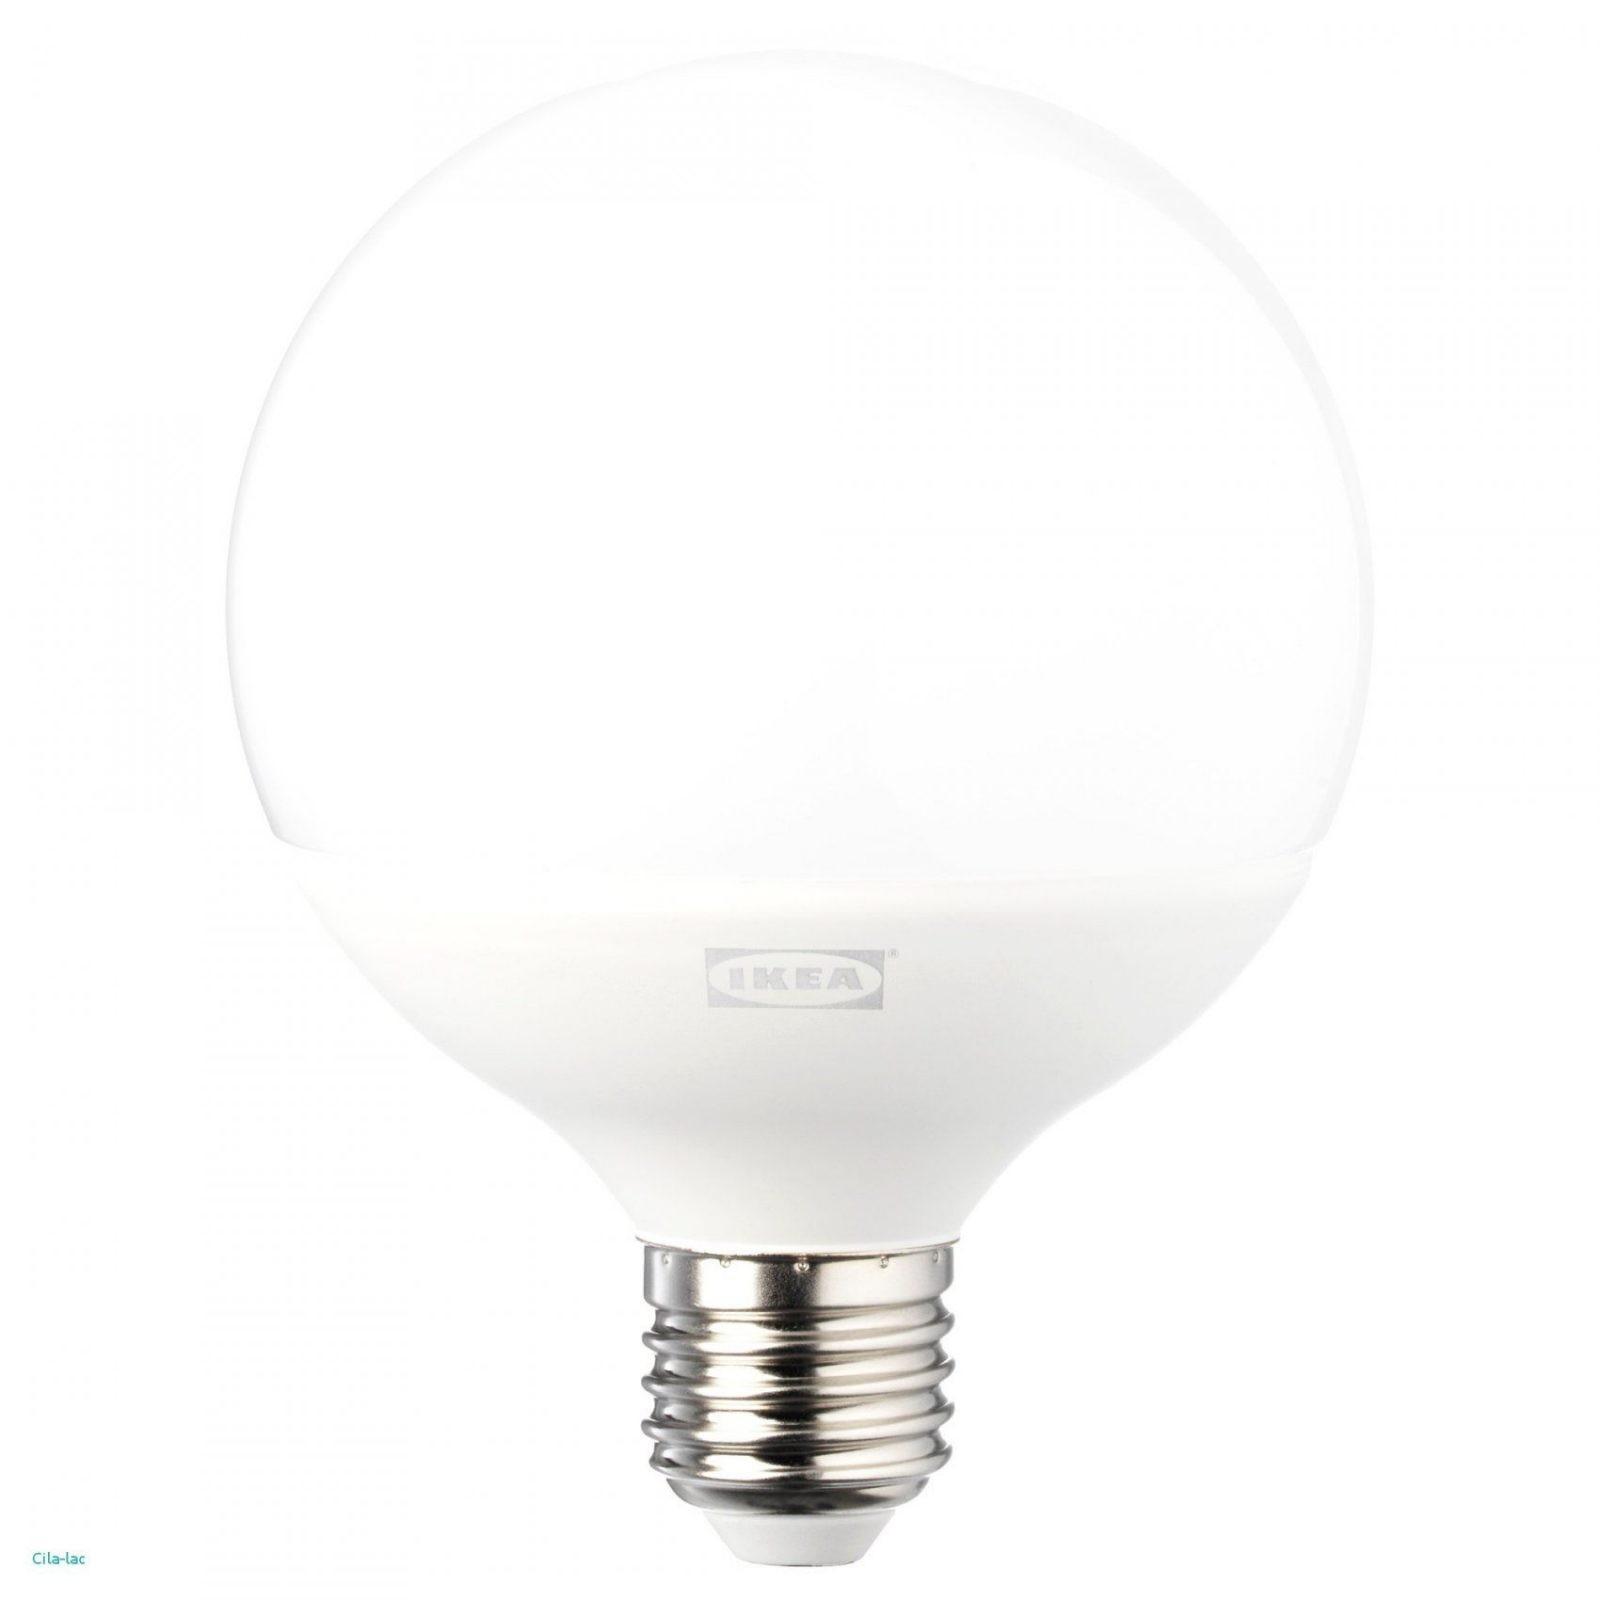 ikea led lampen incredible foto betreffend ikea led lampen. Black Bedroom Furniture Sets. Home Design Ideas